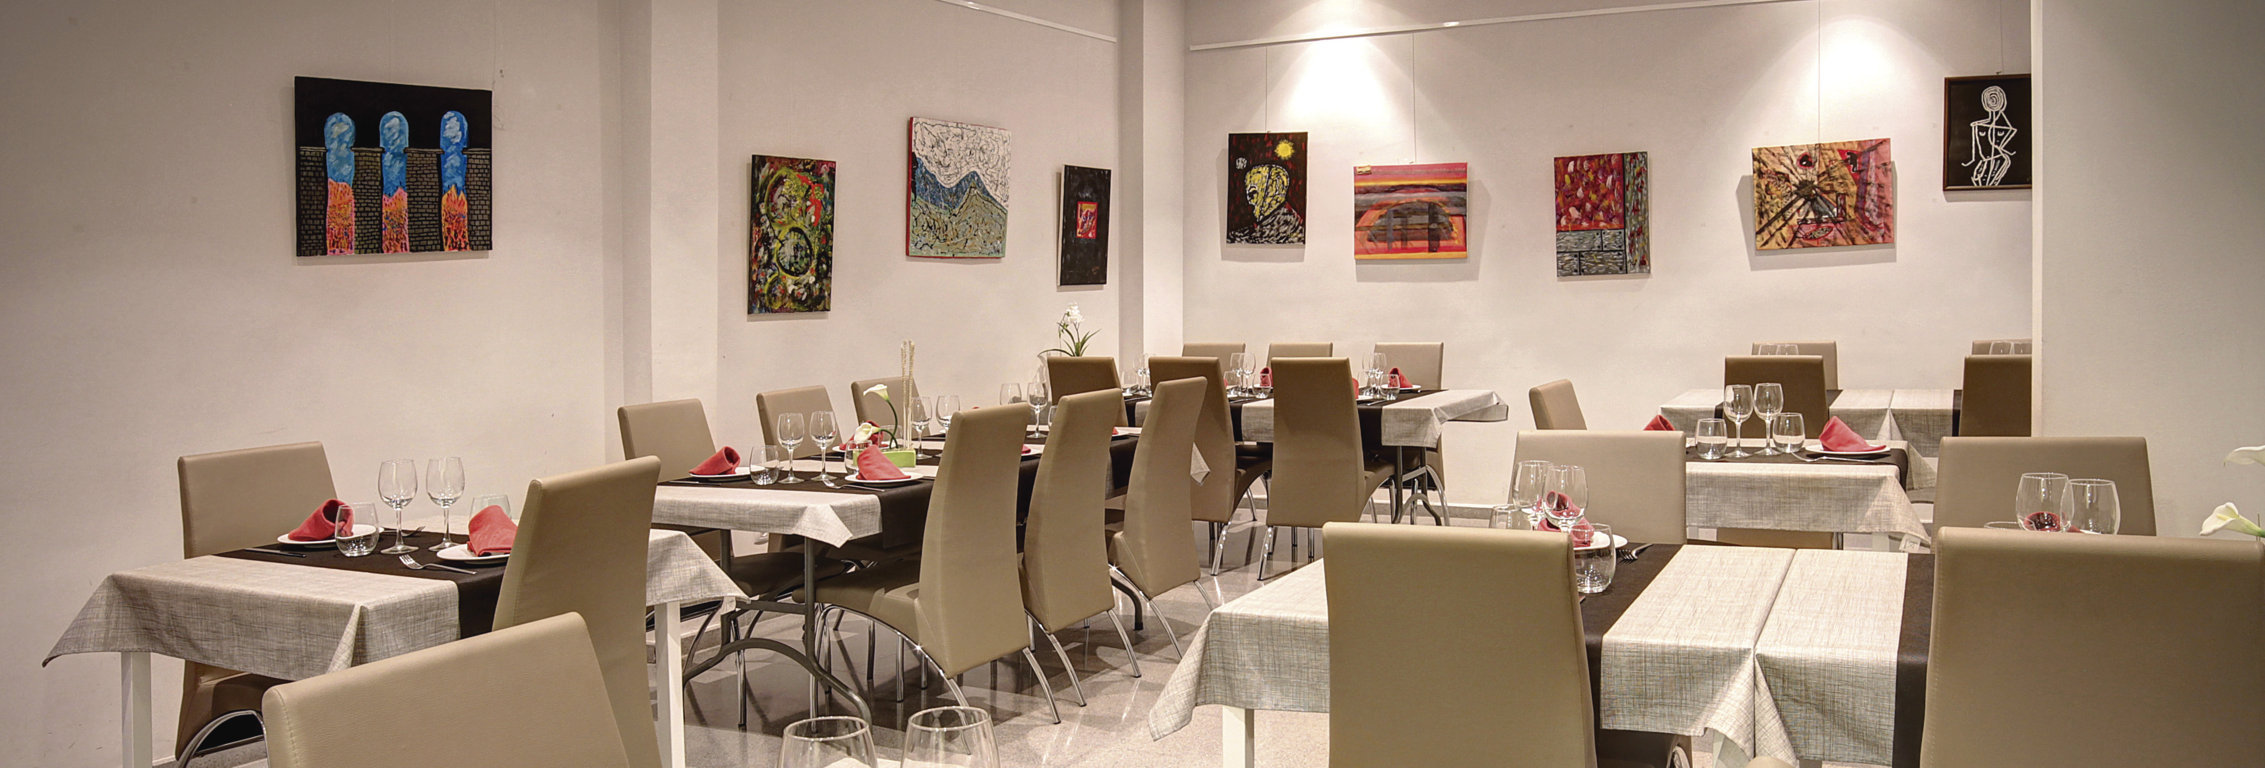 restaurant mora ebre tarragona-01 (FILEminimizer)